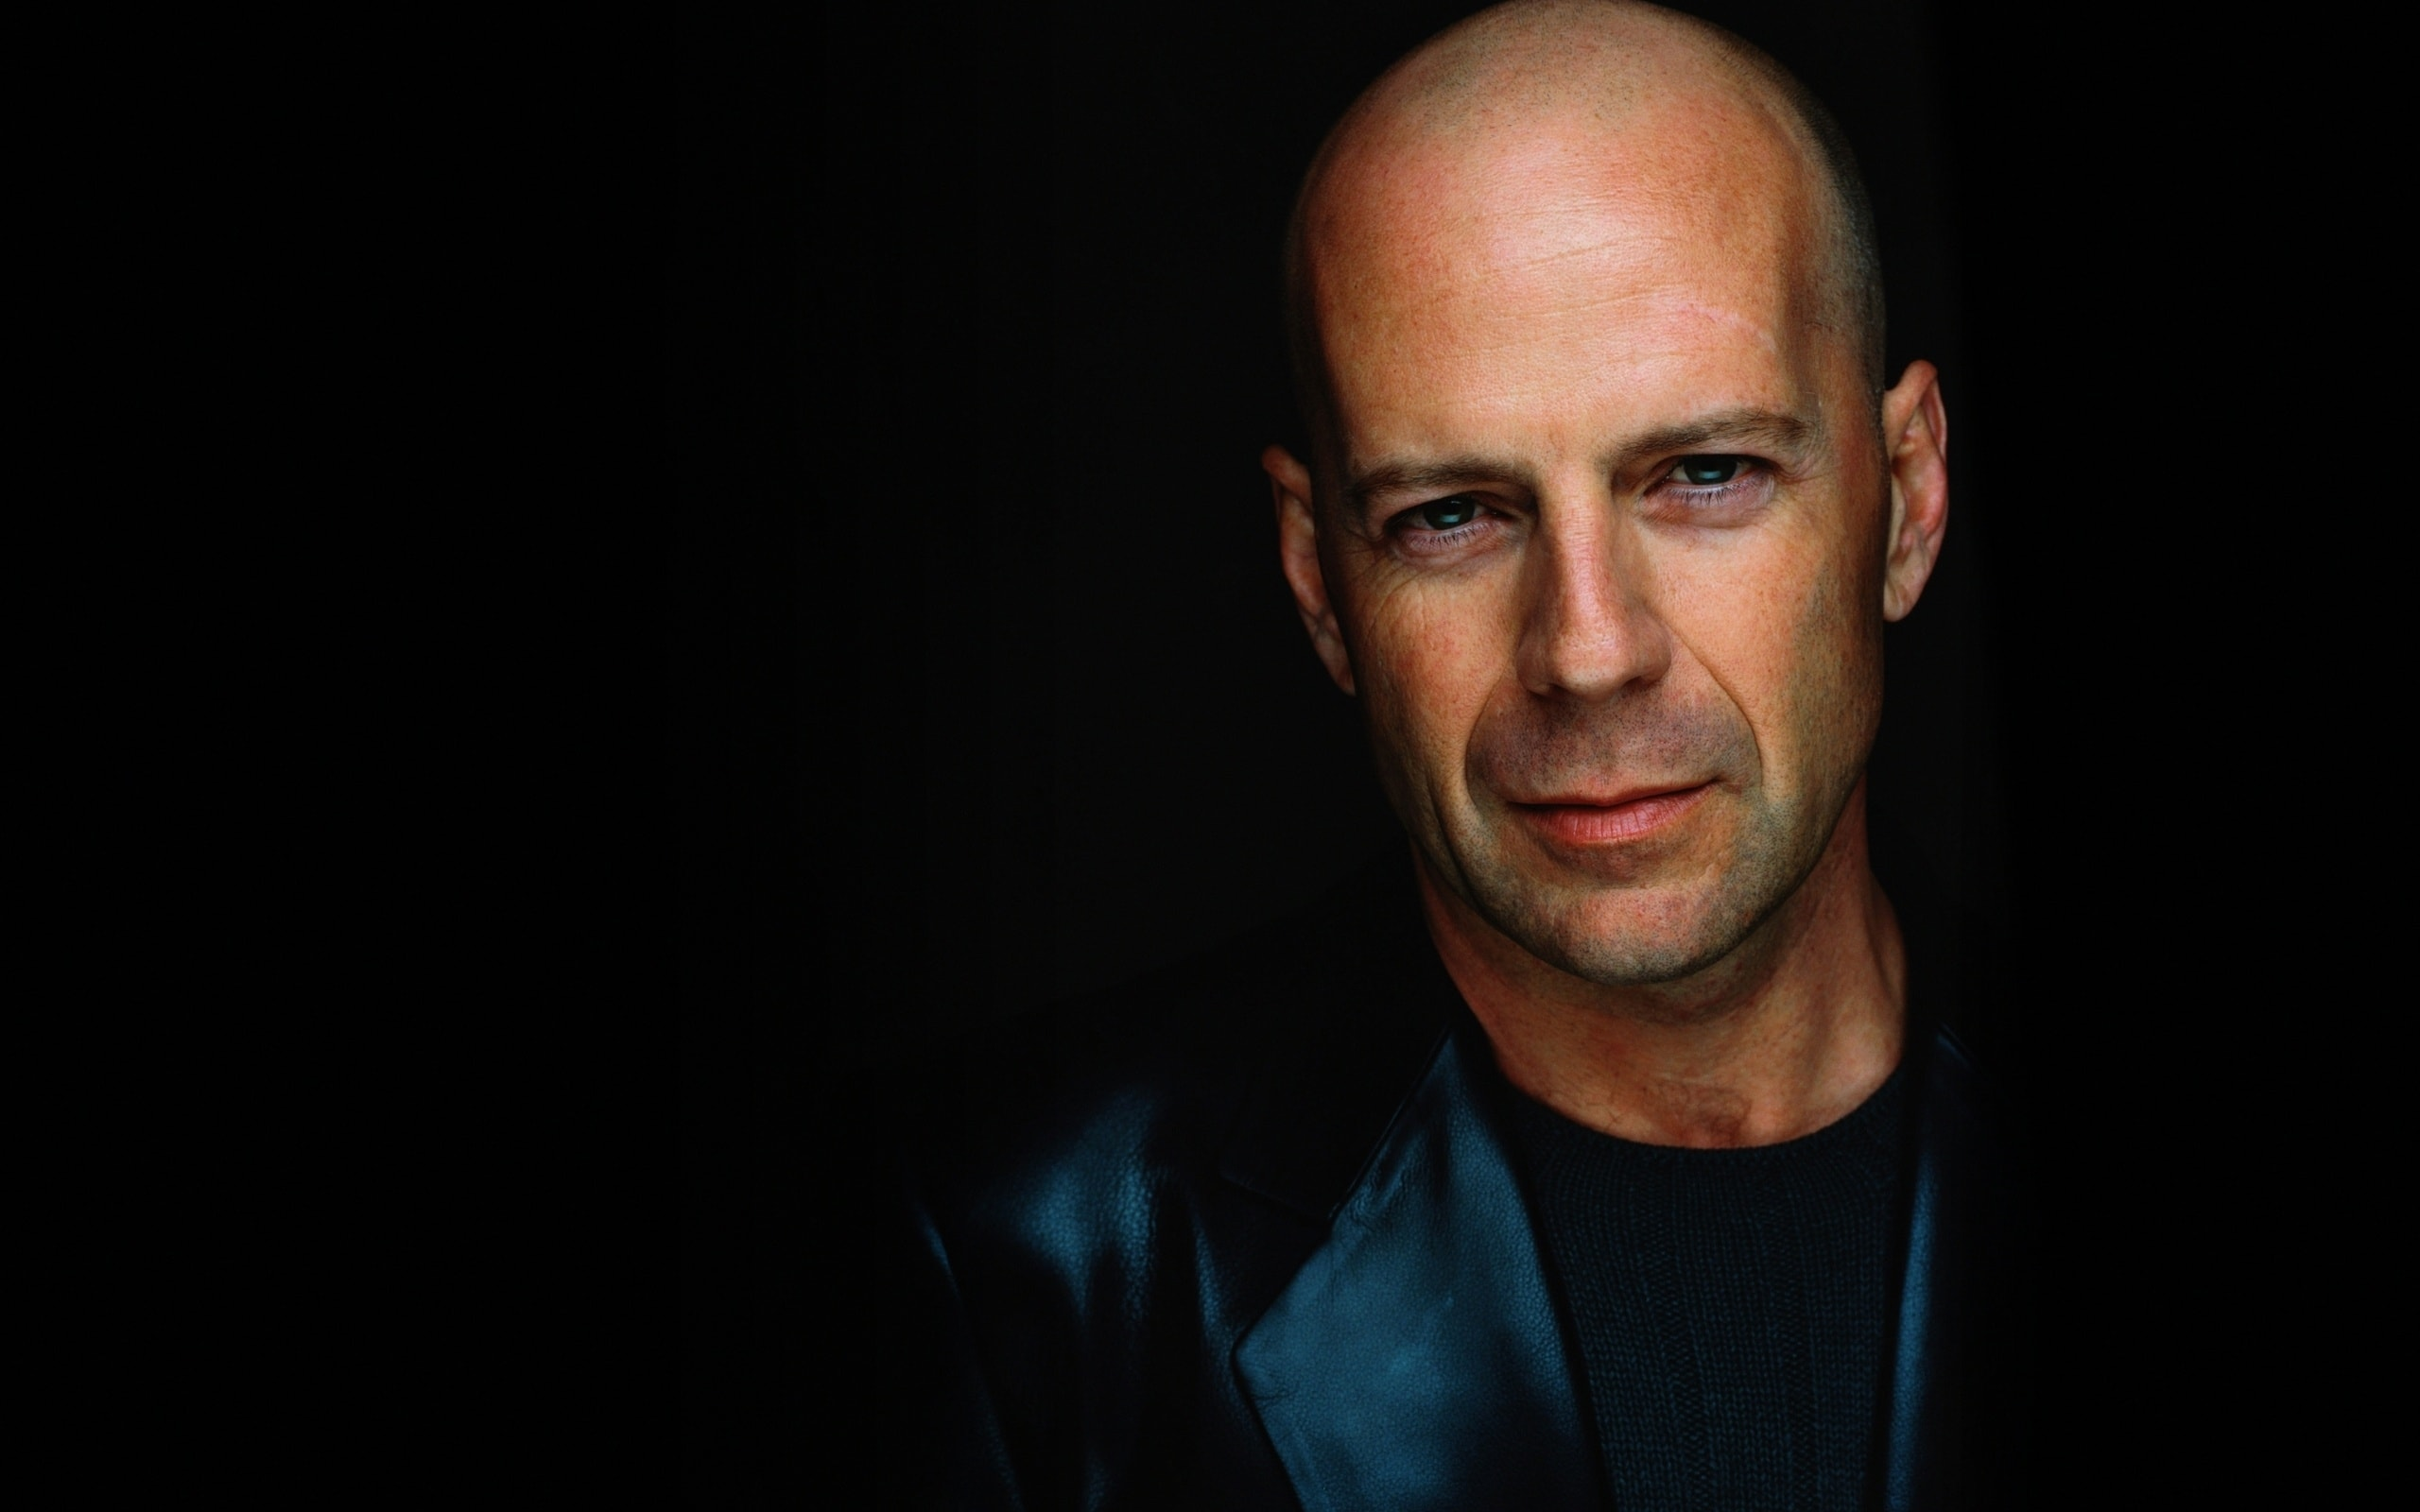 Bruce Willis Wallpapers